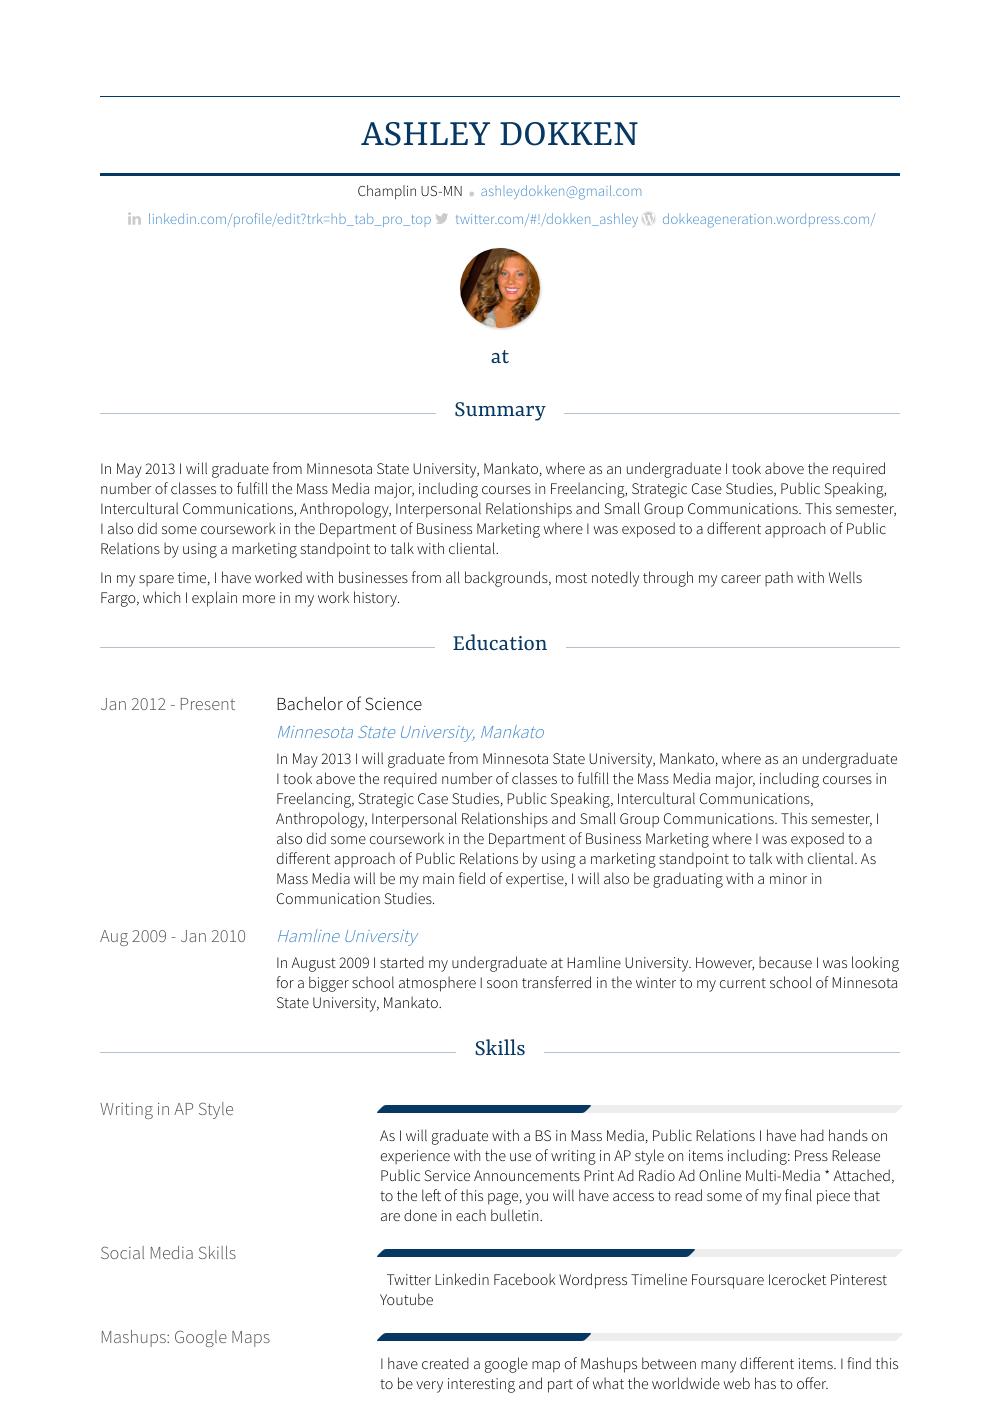 teller  resume samples and templates  visualcv